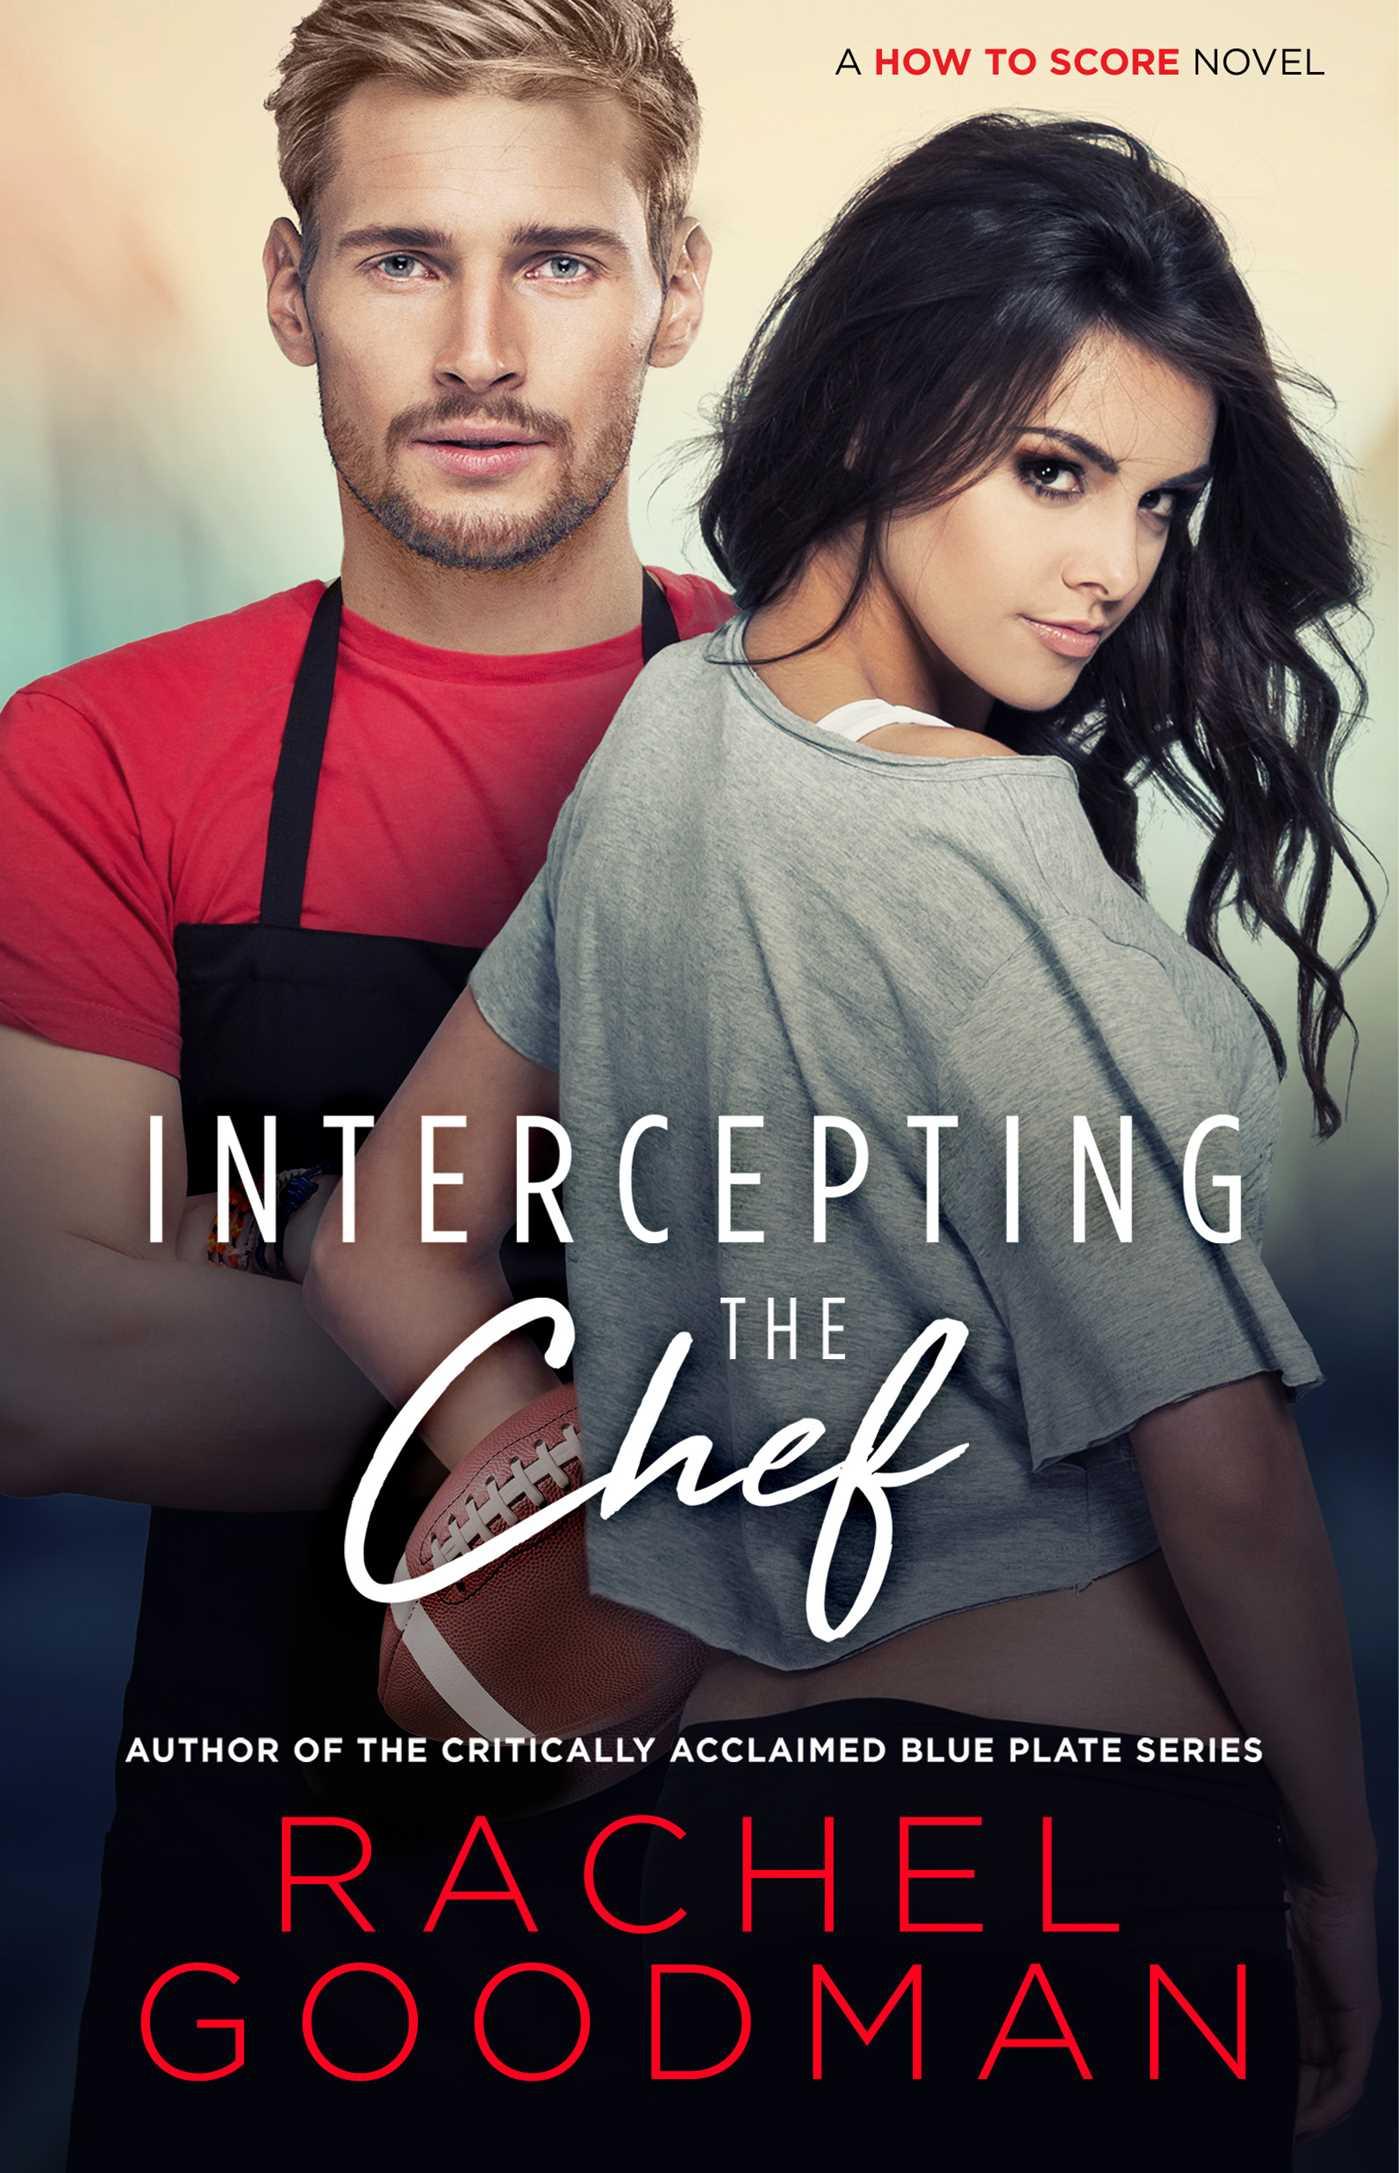 Intercepting the chef 9781501158926 hr